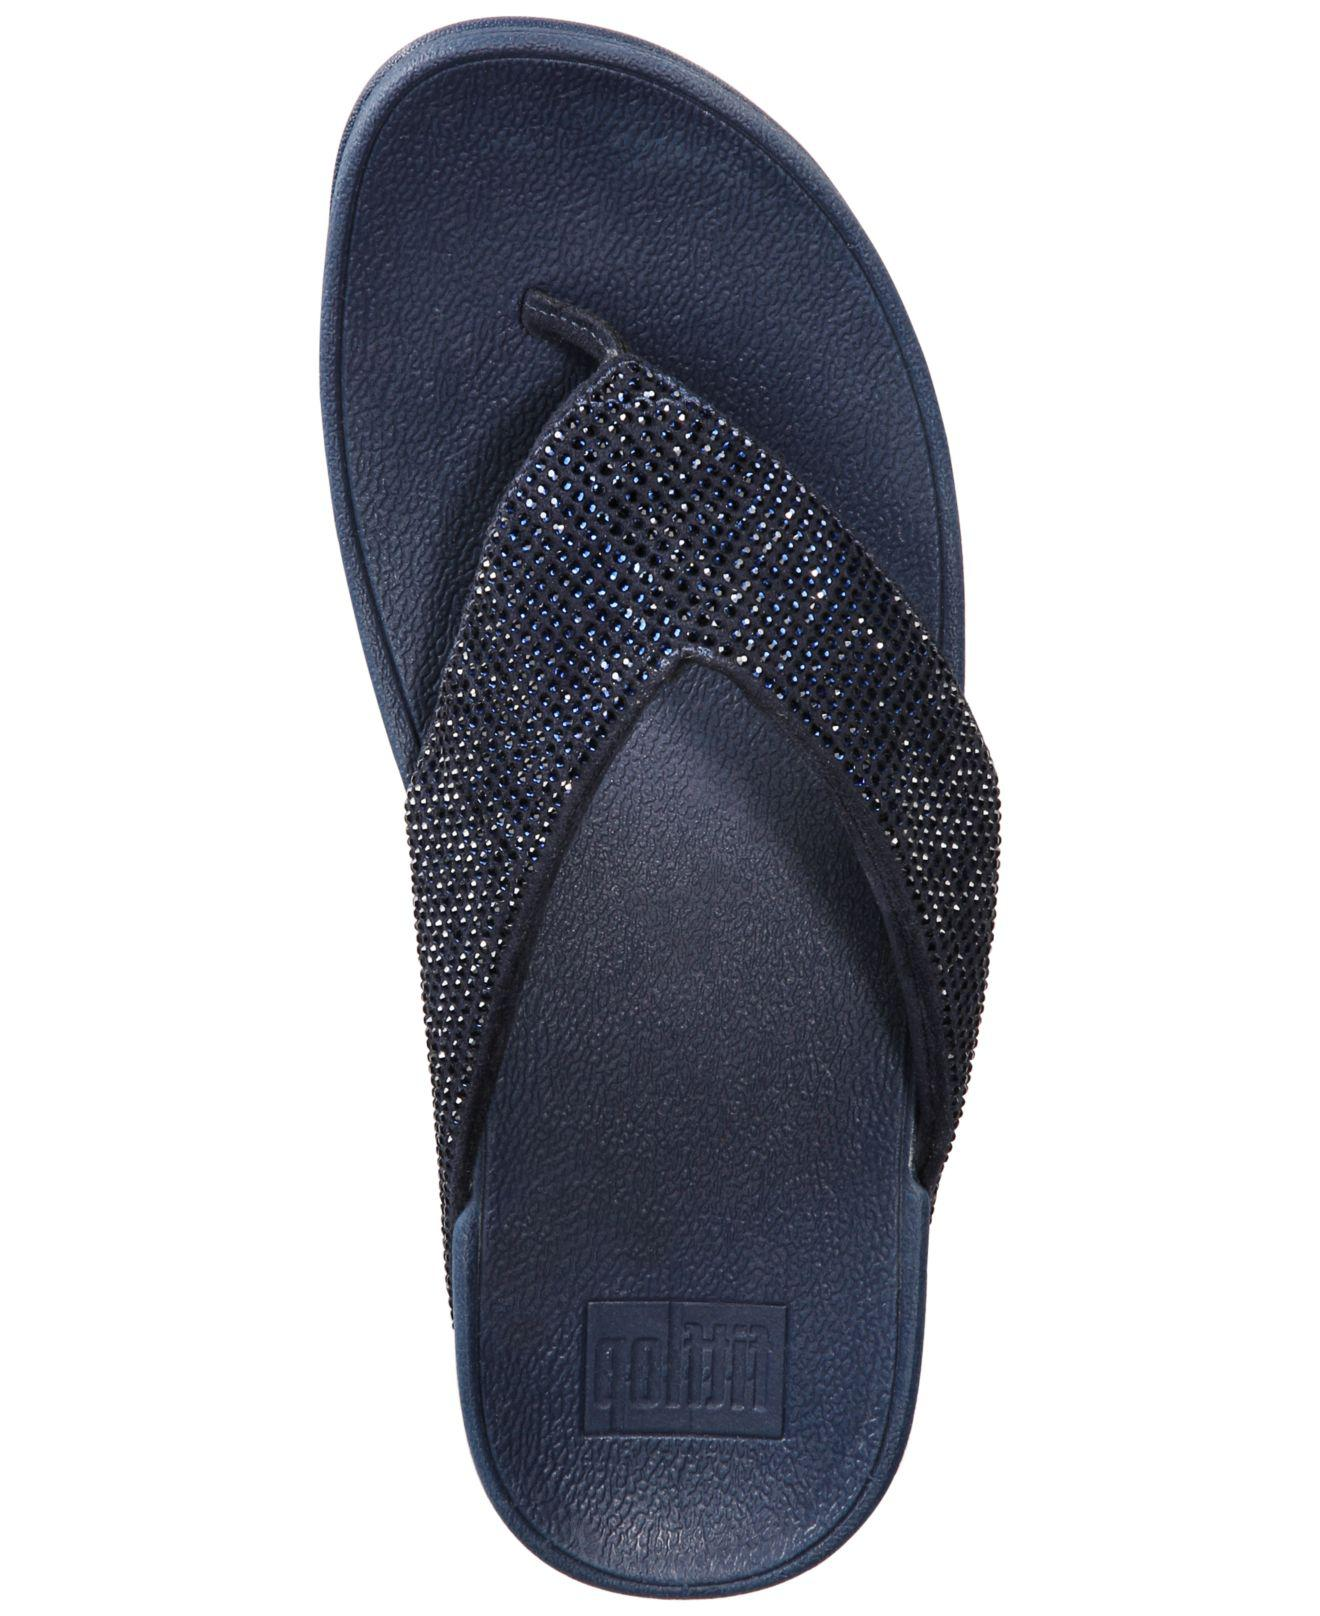 01792d523 Fitflop - Blue Ritzy Toe-thong Sandals - Lyst. View fullscreen